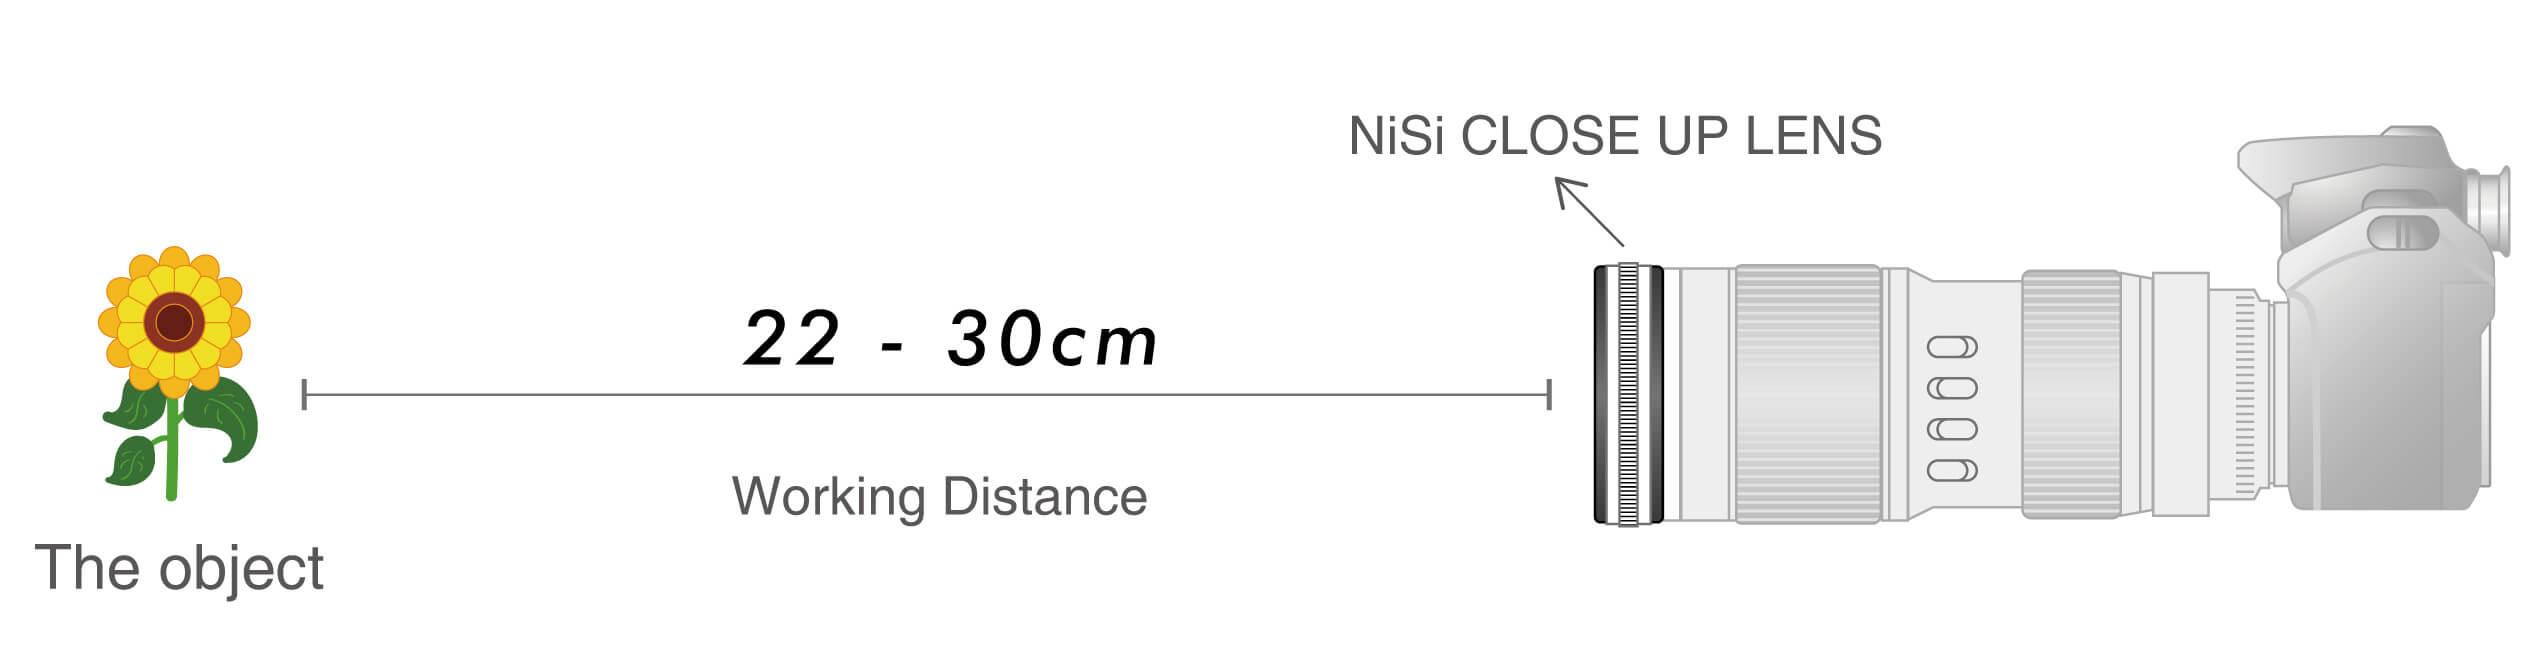 NiSi Close up lens